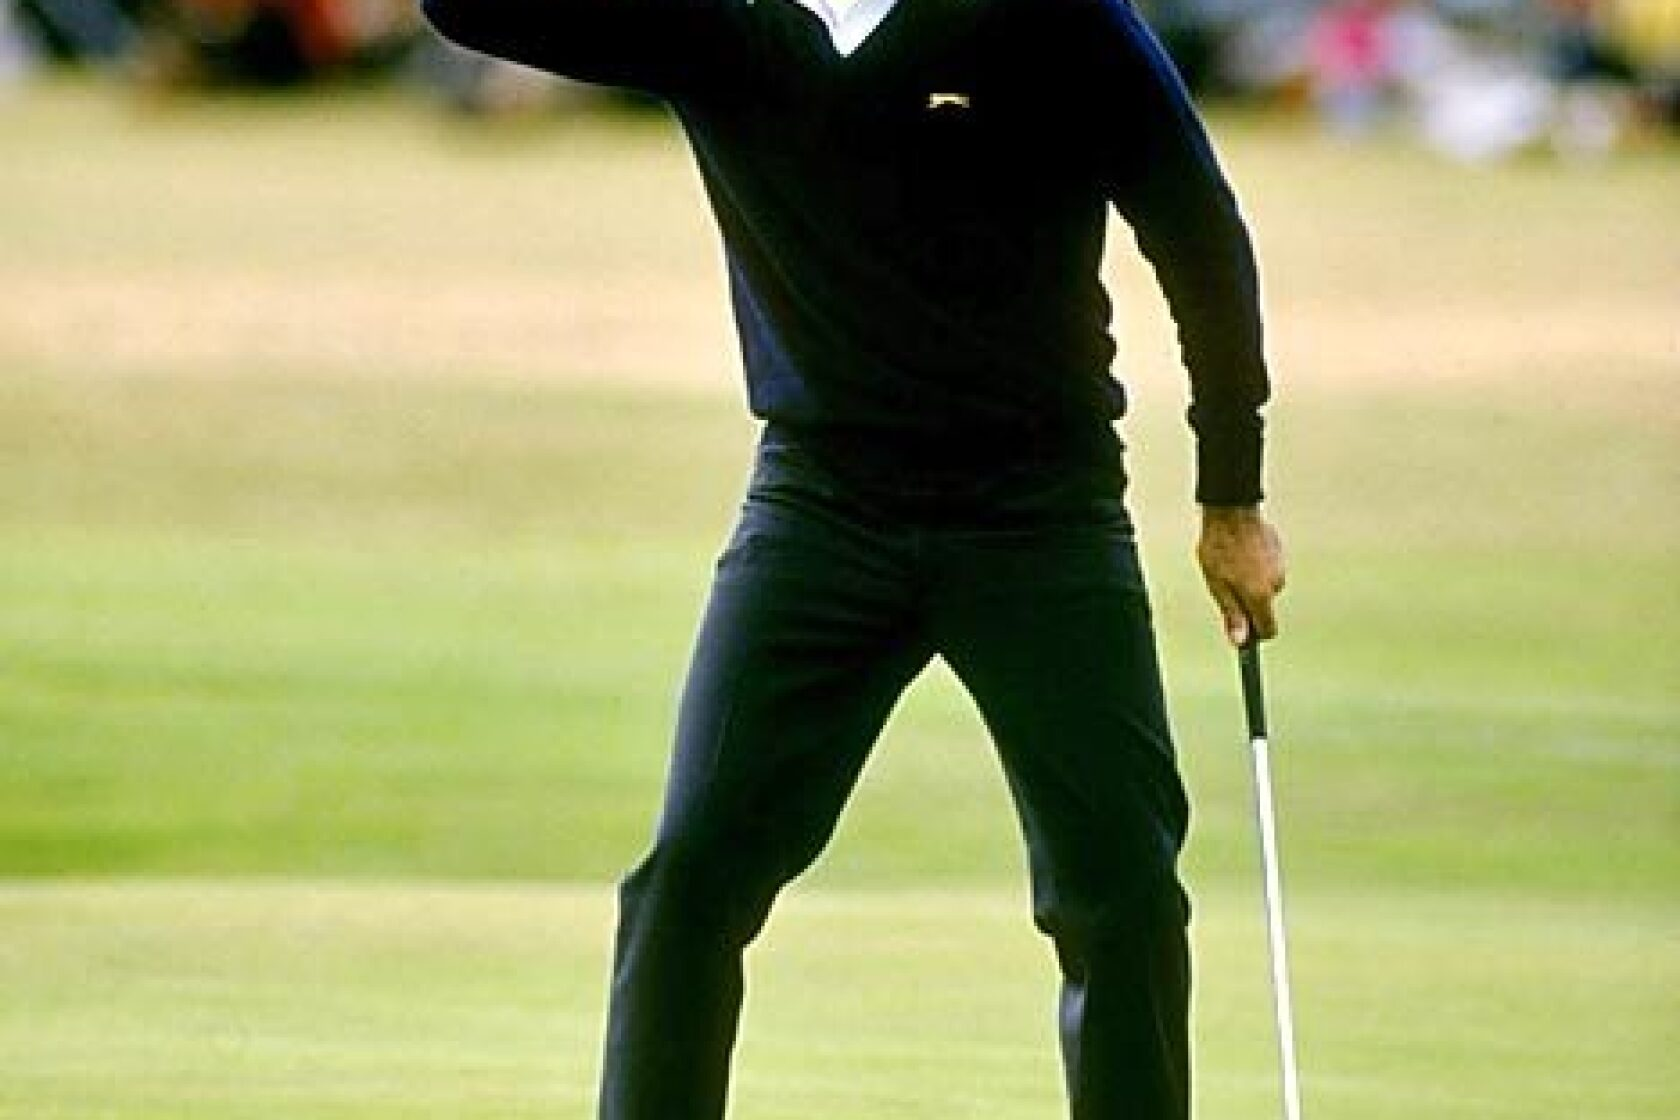 Seve Ballesteros obituary: Golfer Seve Ballesteros dies at